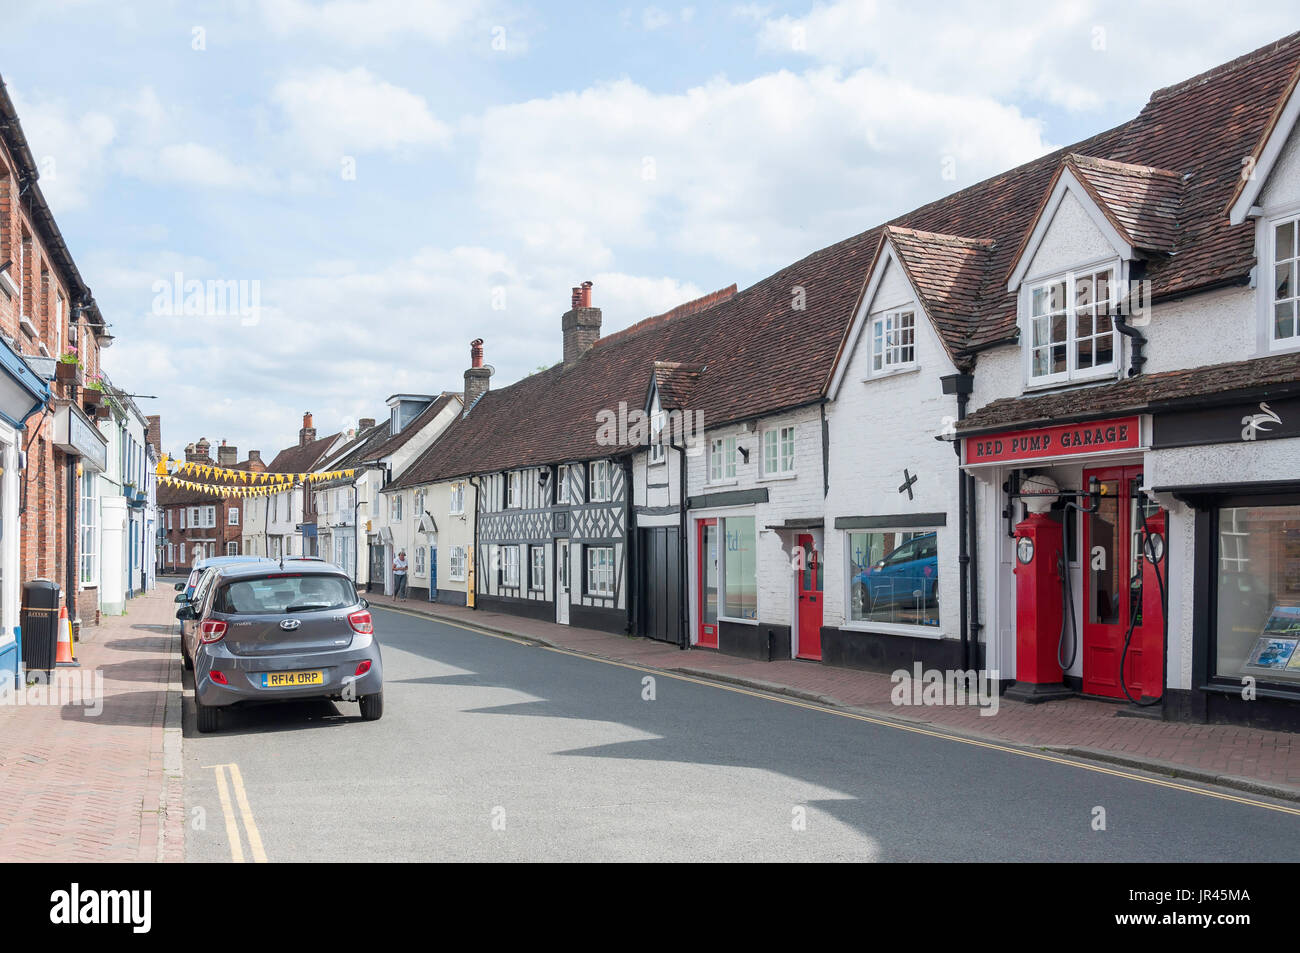 High Street, Great Missenden, Buckinghamshire, England, United Kingdom - Stock Image